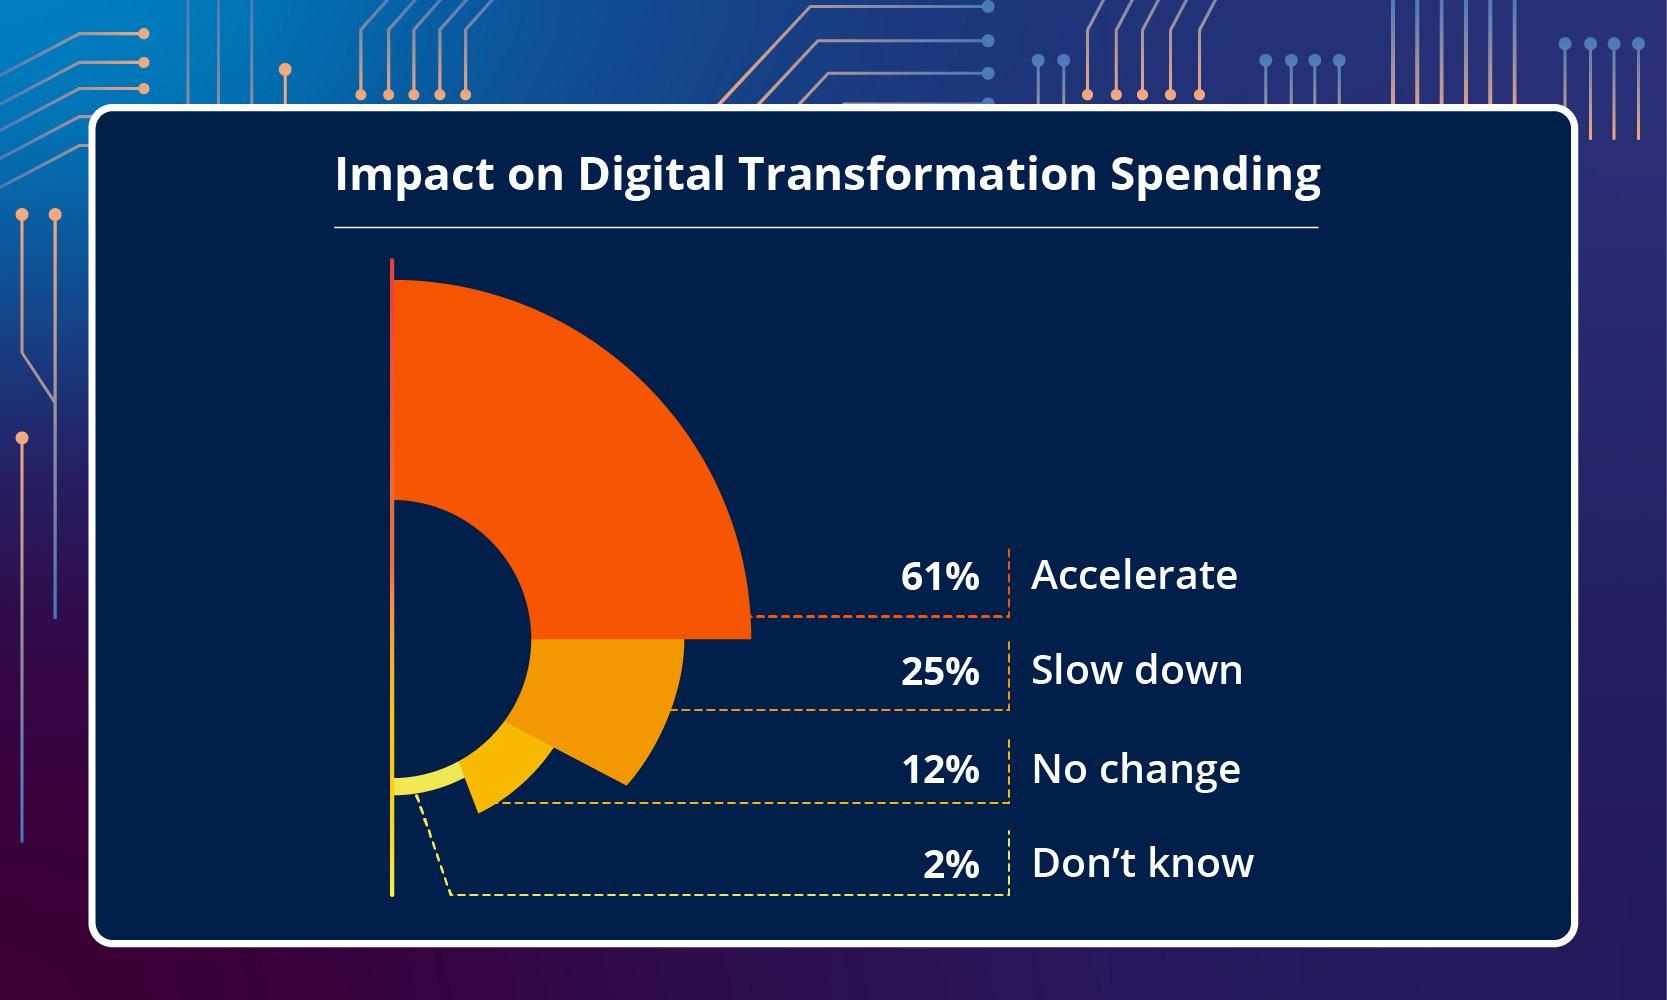 Impact on Digital Transformation Spending